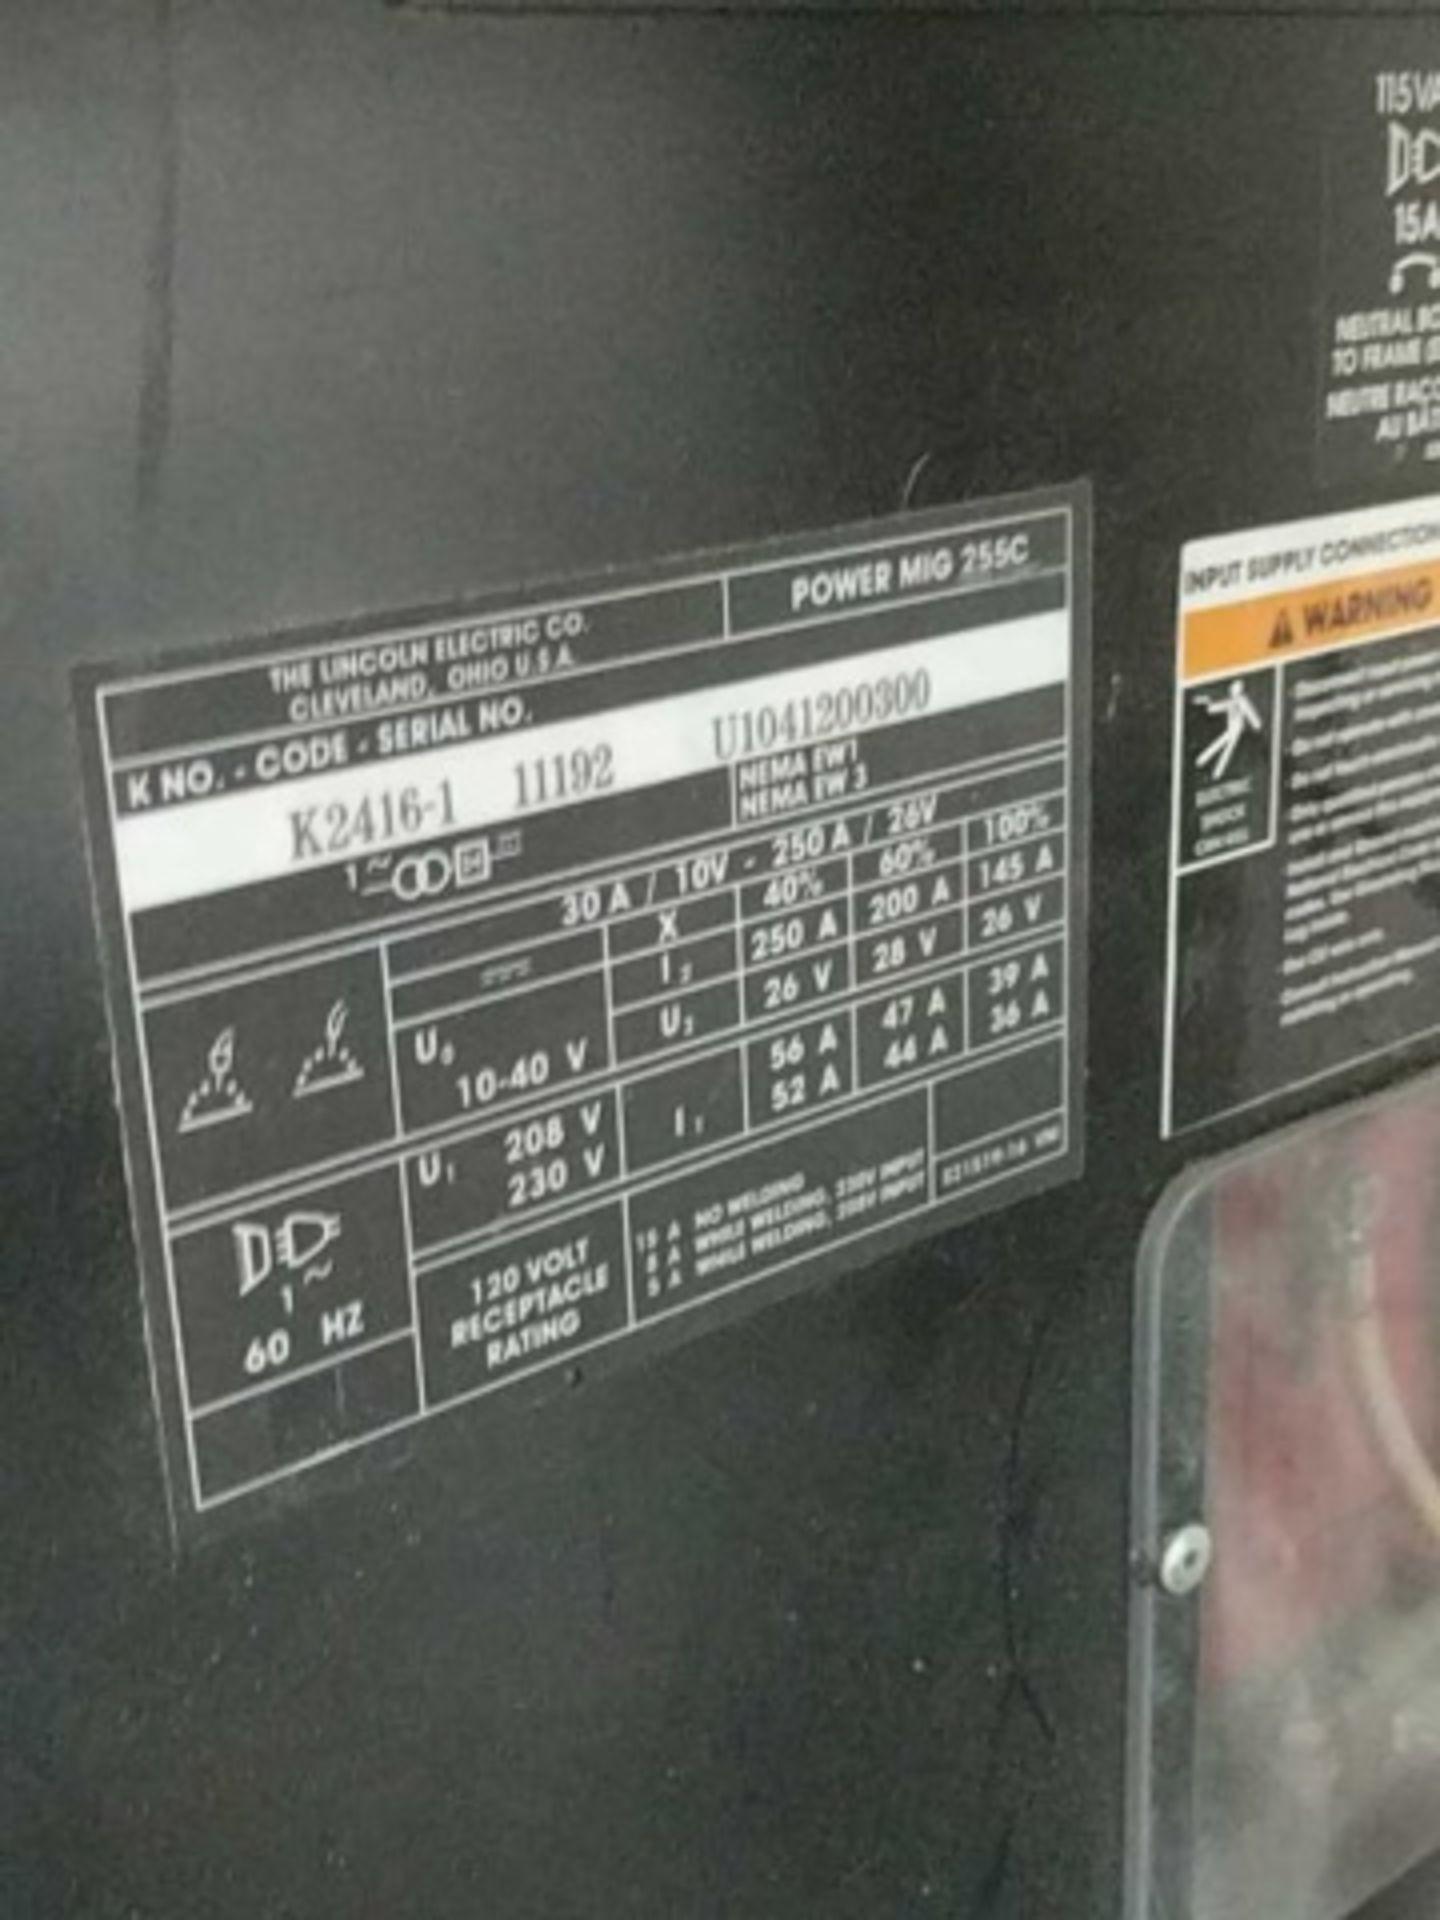 Lincoln Power Mig 255C Mig Welder - Image 4 of 4